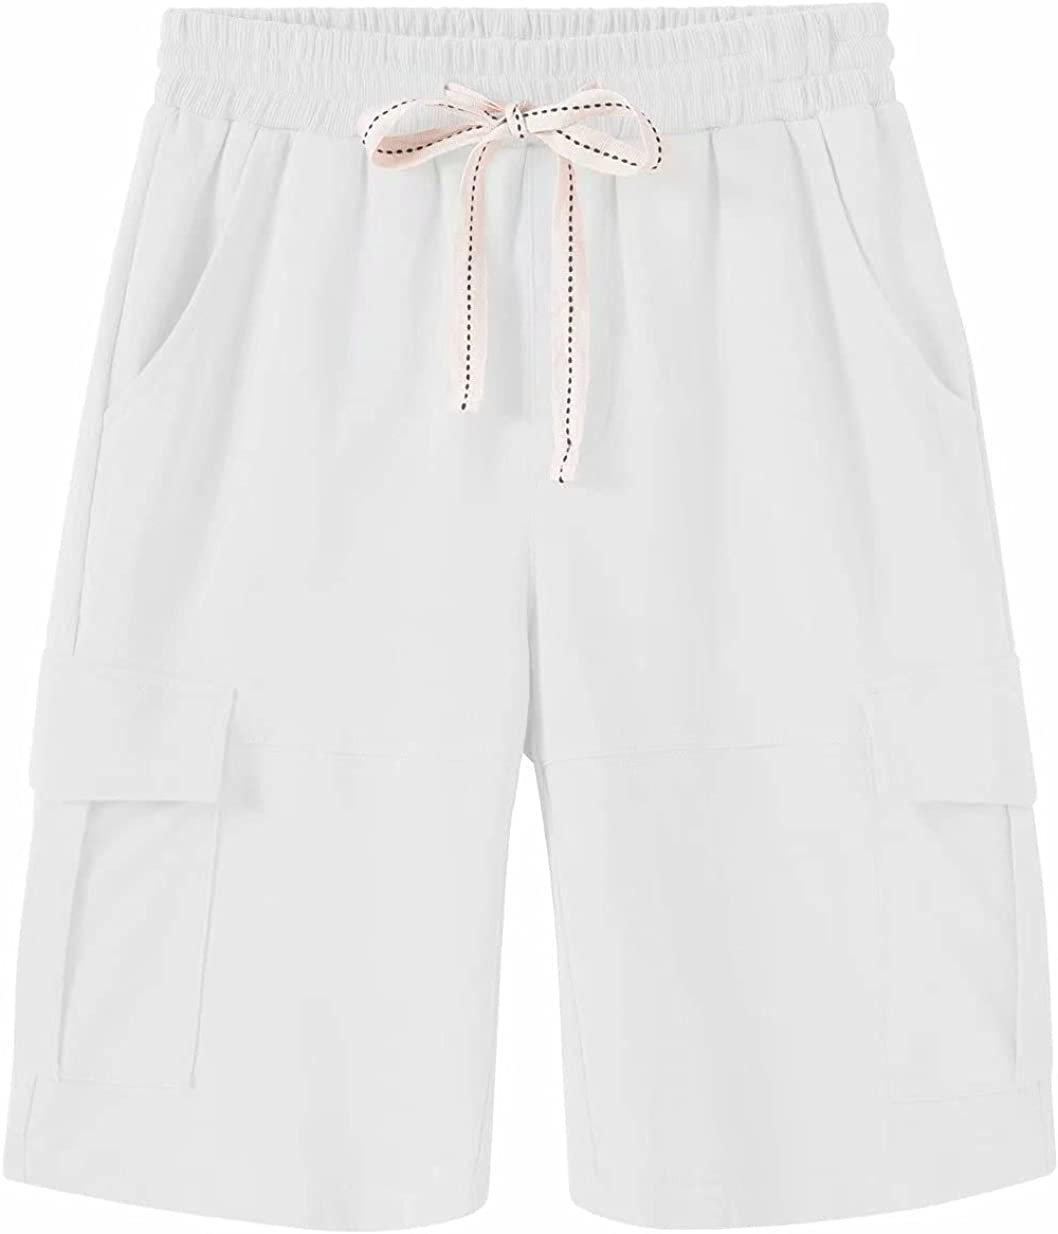 Max 81% OFF Msmsse Women's Casual Cargo Tucson Mall Cotton Waist Elastic Shorts Bermuda